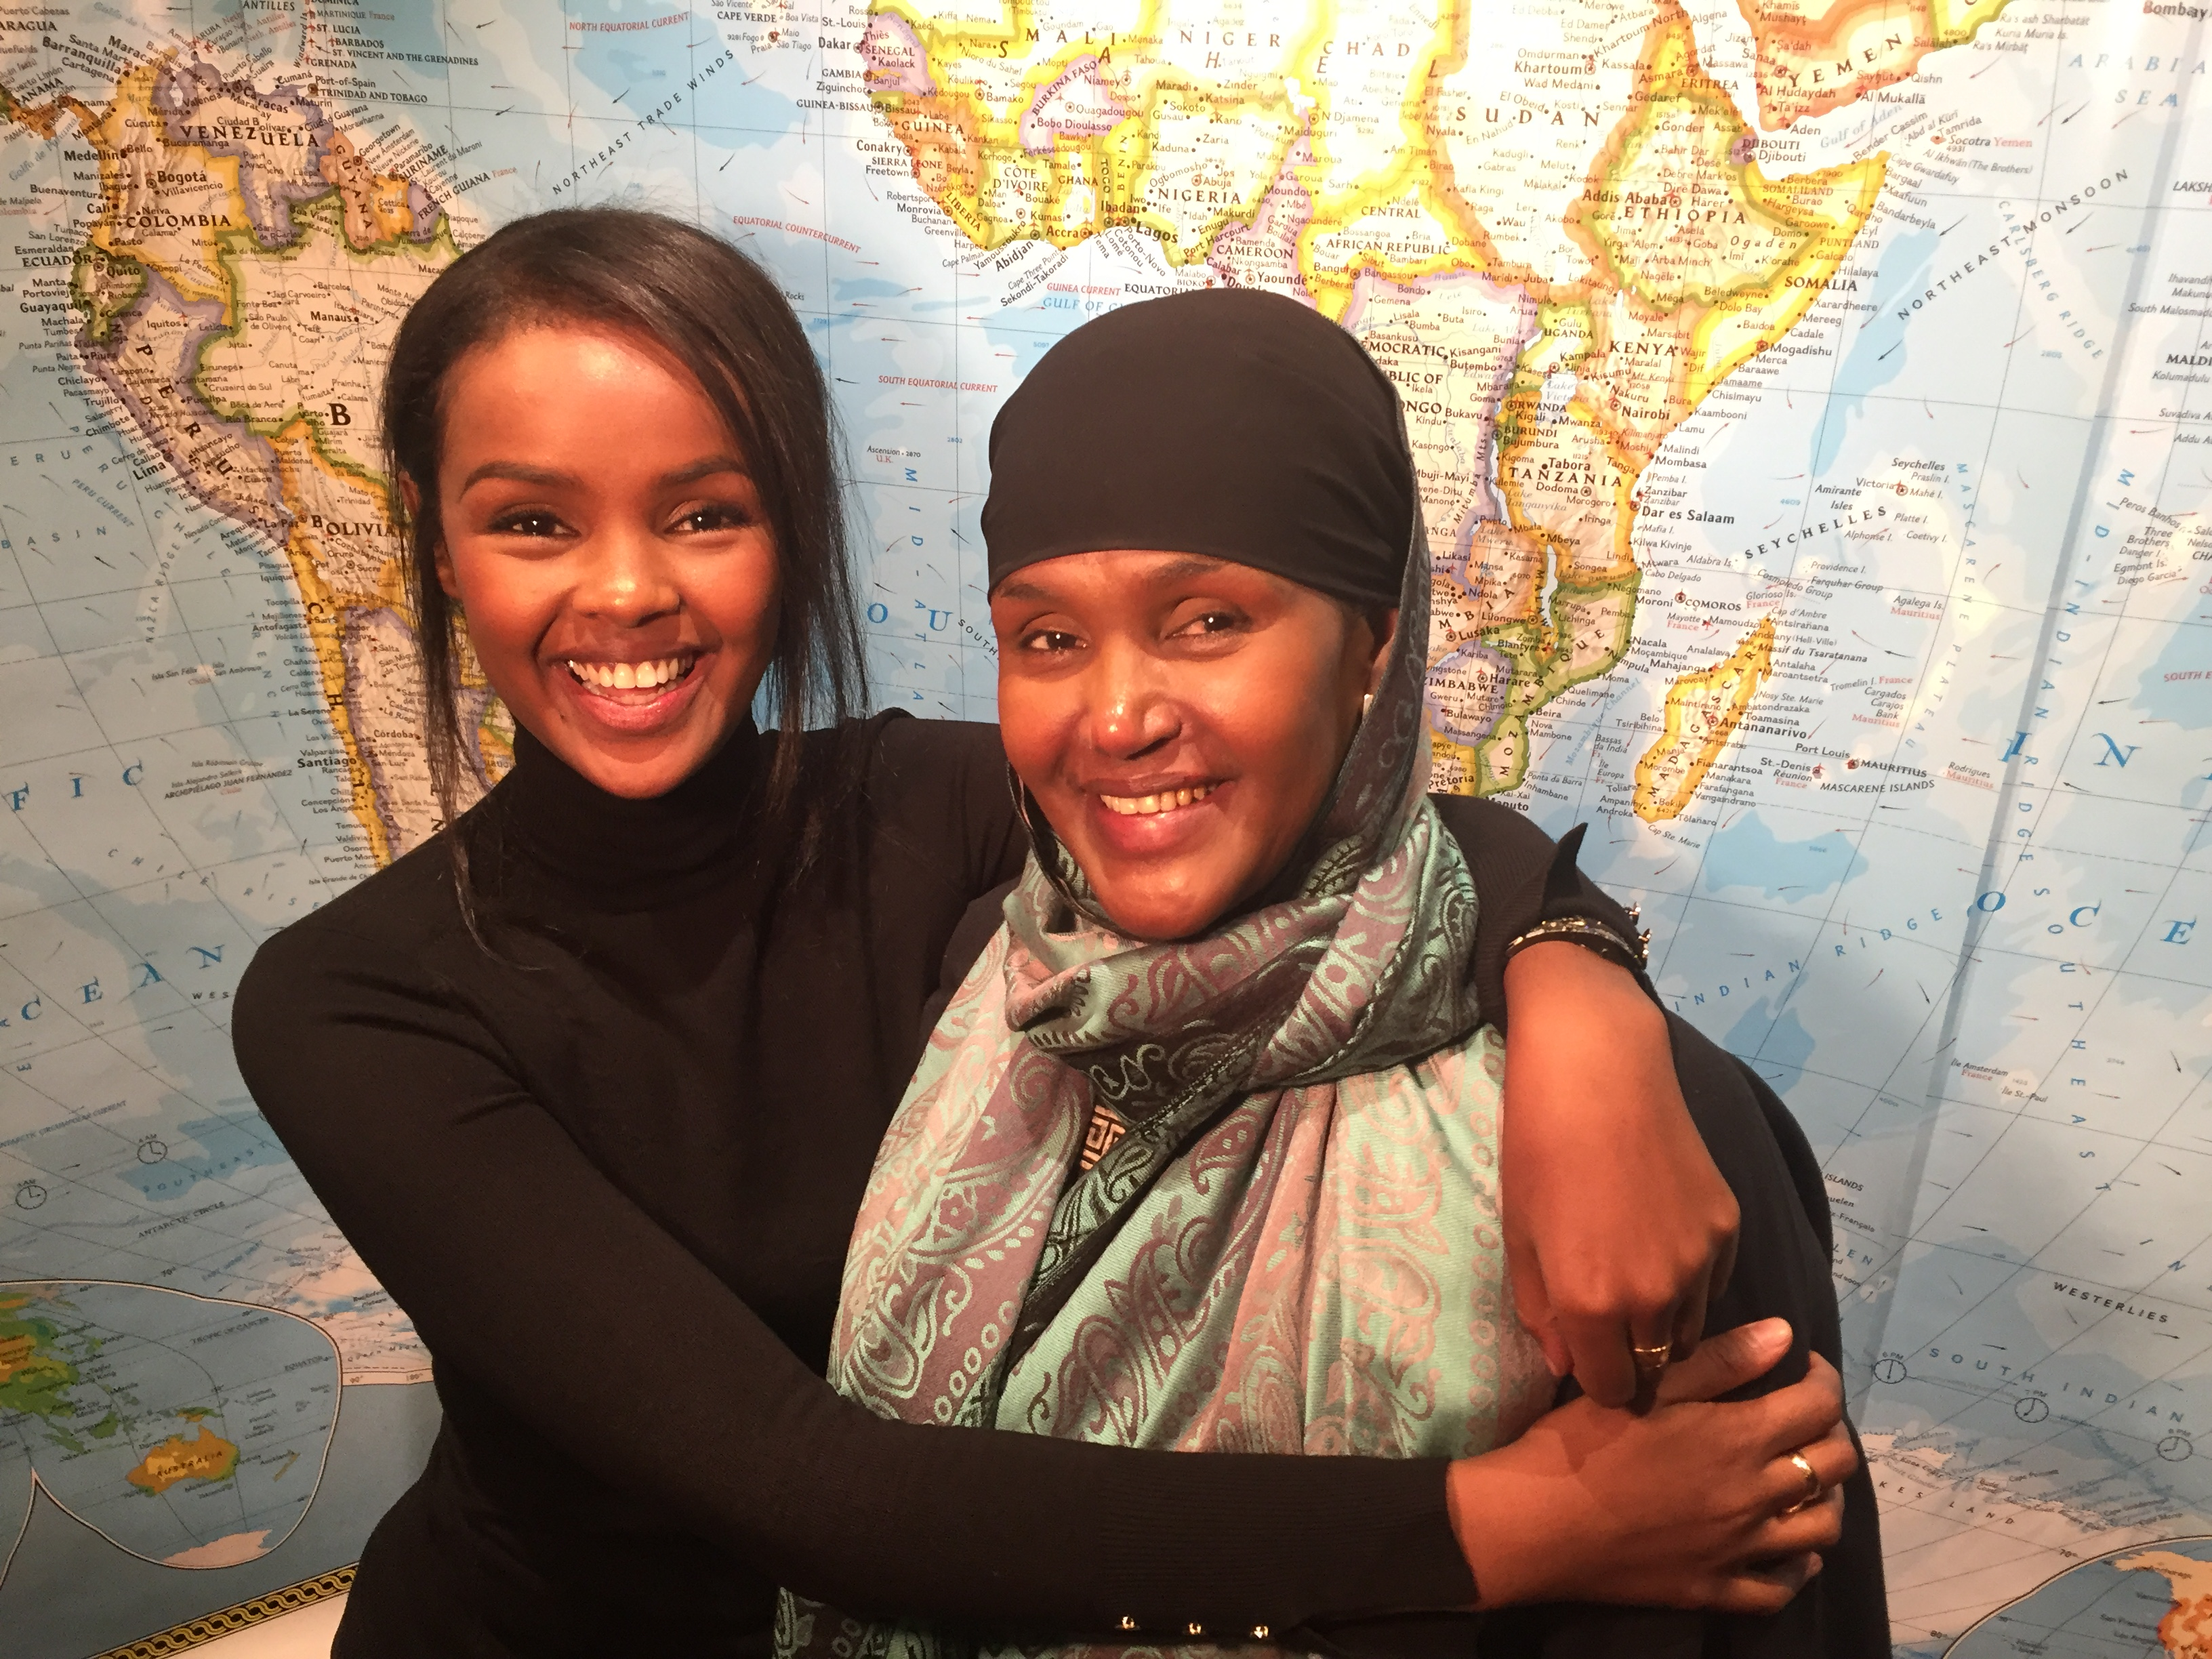 Ilwad Elman and her mother Fartuun Adan created the Elman Peace and Human Rights Center in Mogadishu.